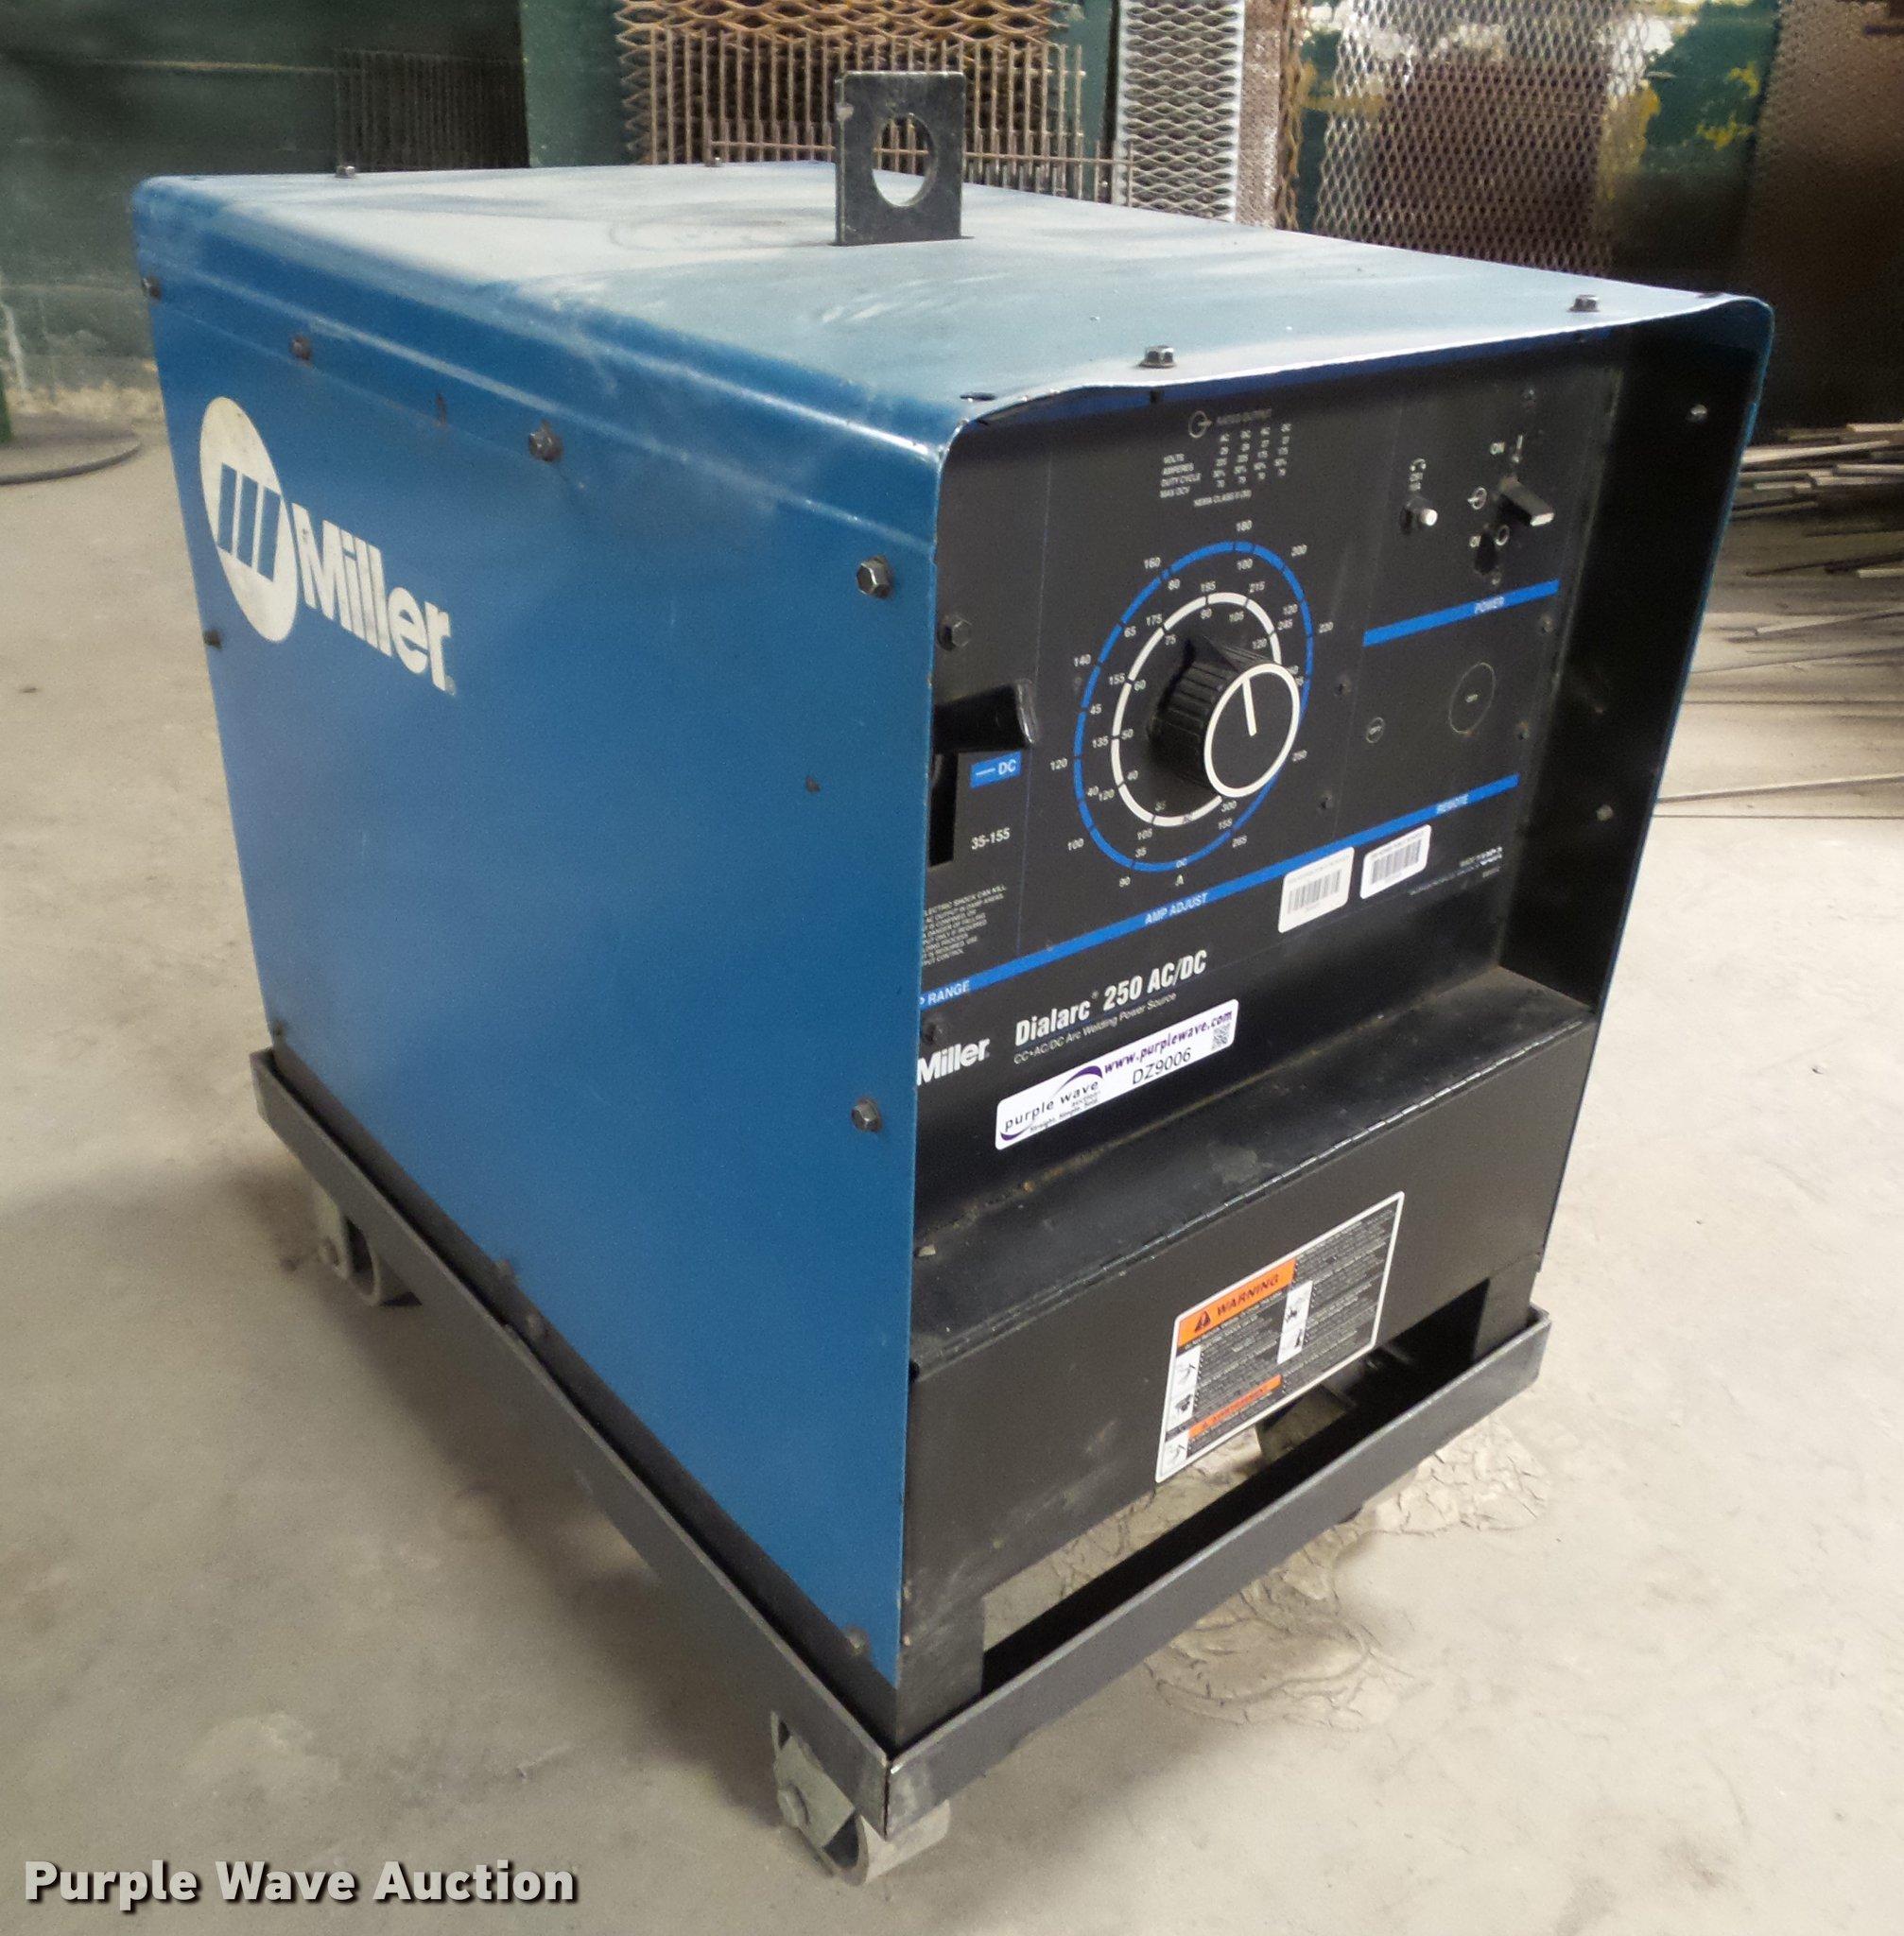 DZ9006 image for item DZ9006 Miller Dialarc 250 AC/DC welder